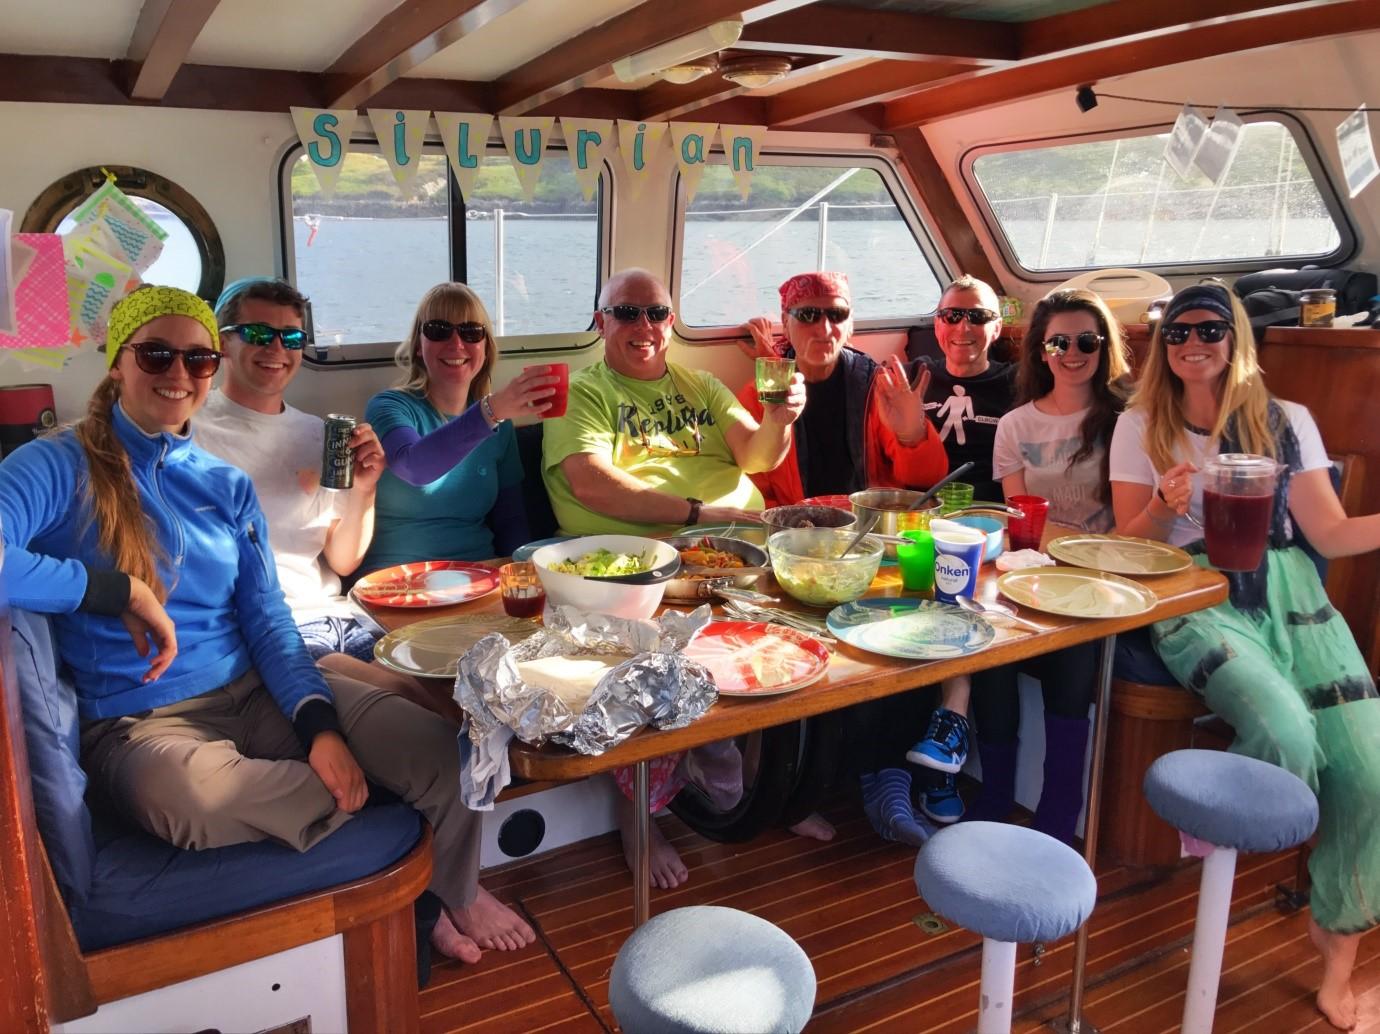 Celebrating summer solstice on board Silurian